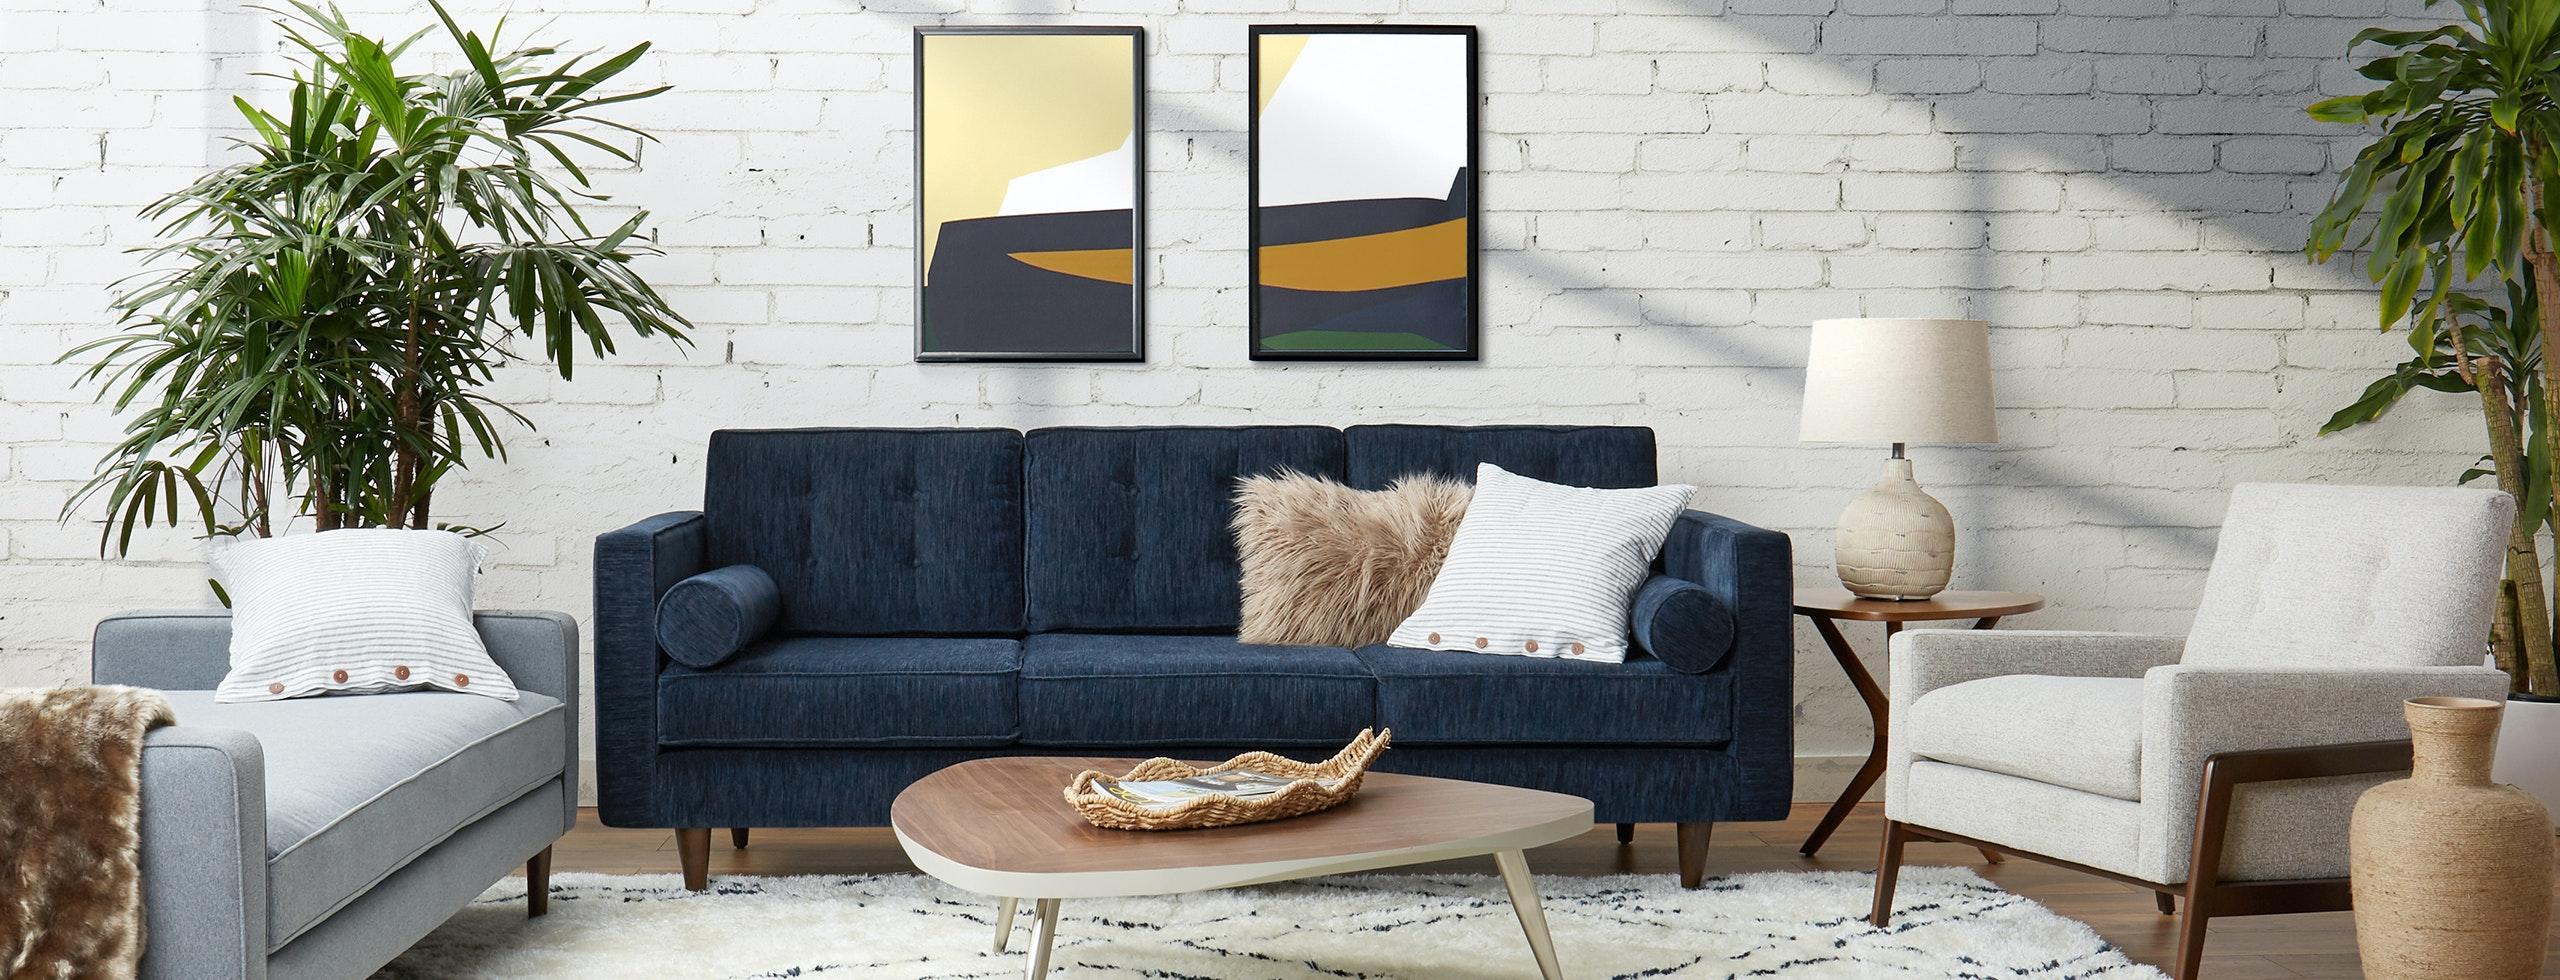 Main Gallery Image